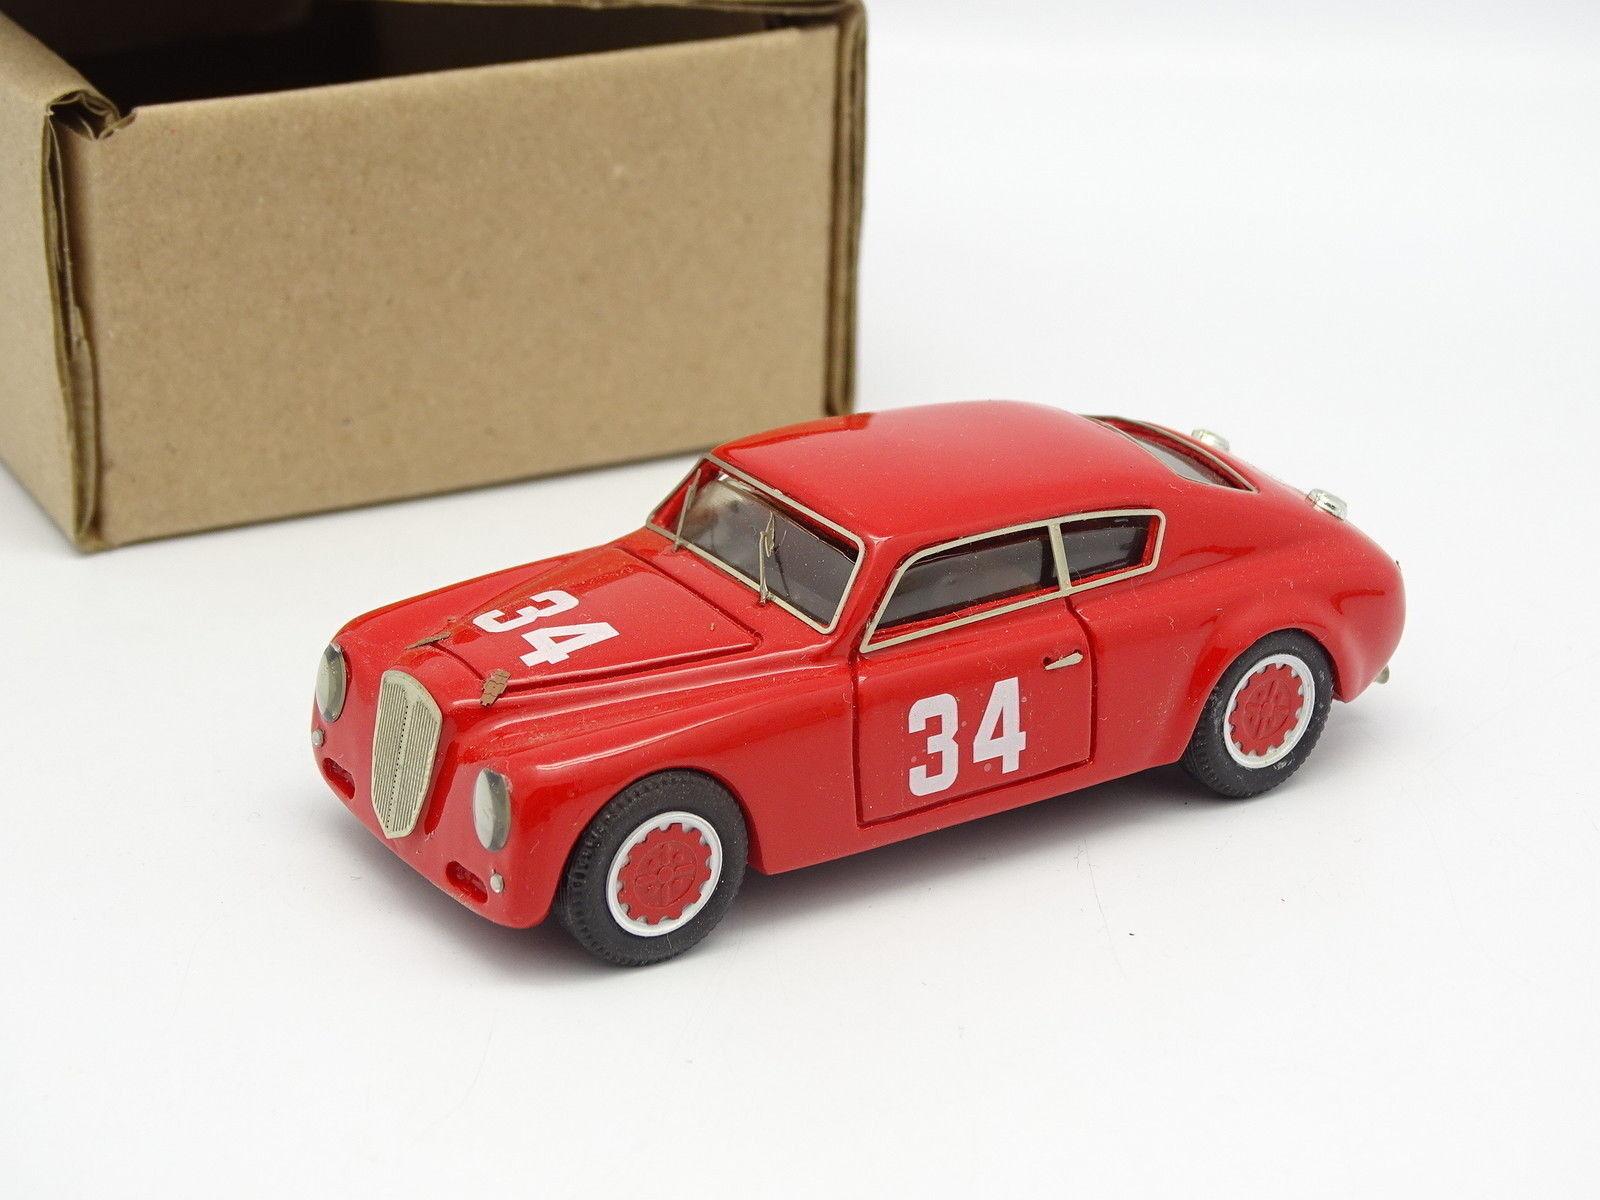 JOLLY Modelle Set aufgebaut SB 1 43 Lancia B20 Nr.34 Nr.34 Nr.34 Gewinner Targa florio 1952 faf0a6